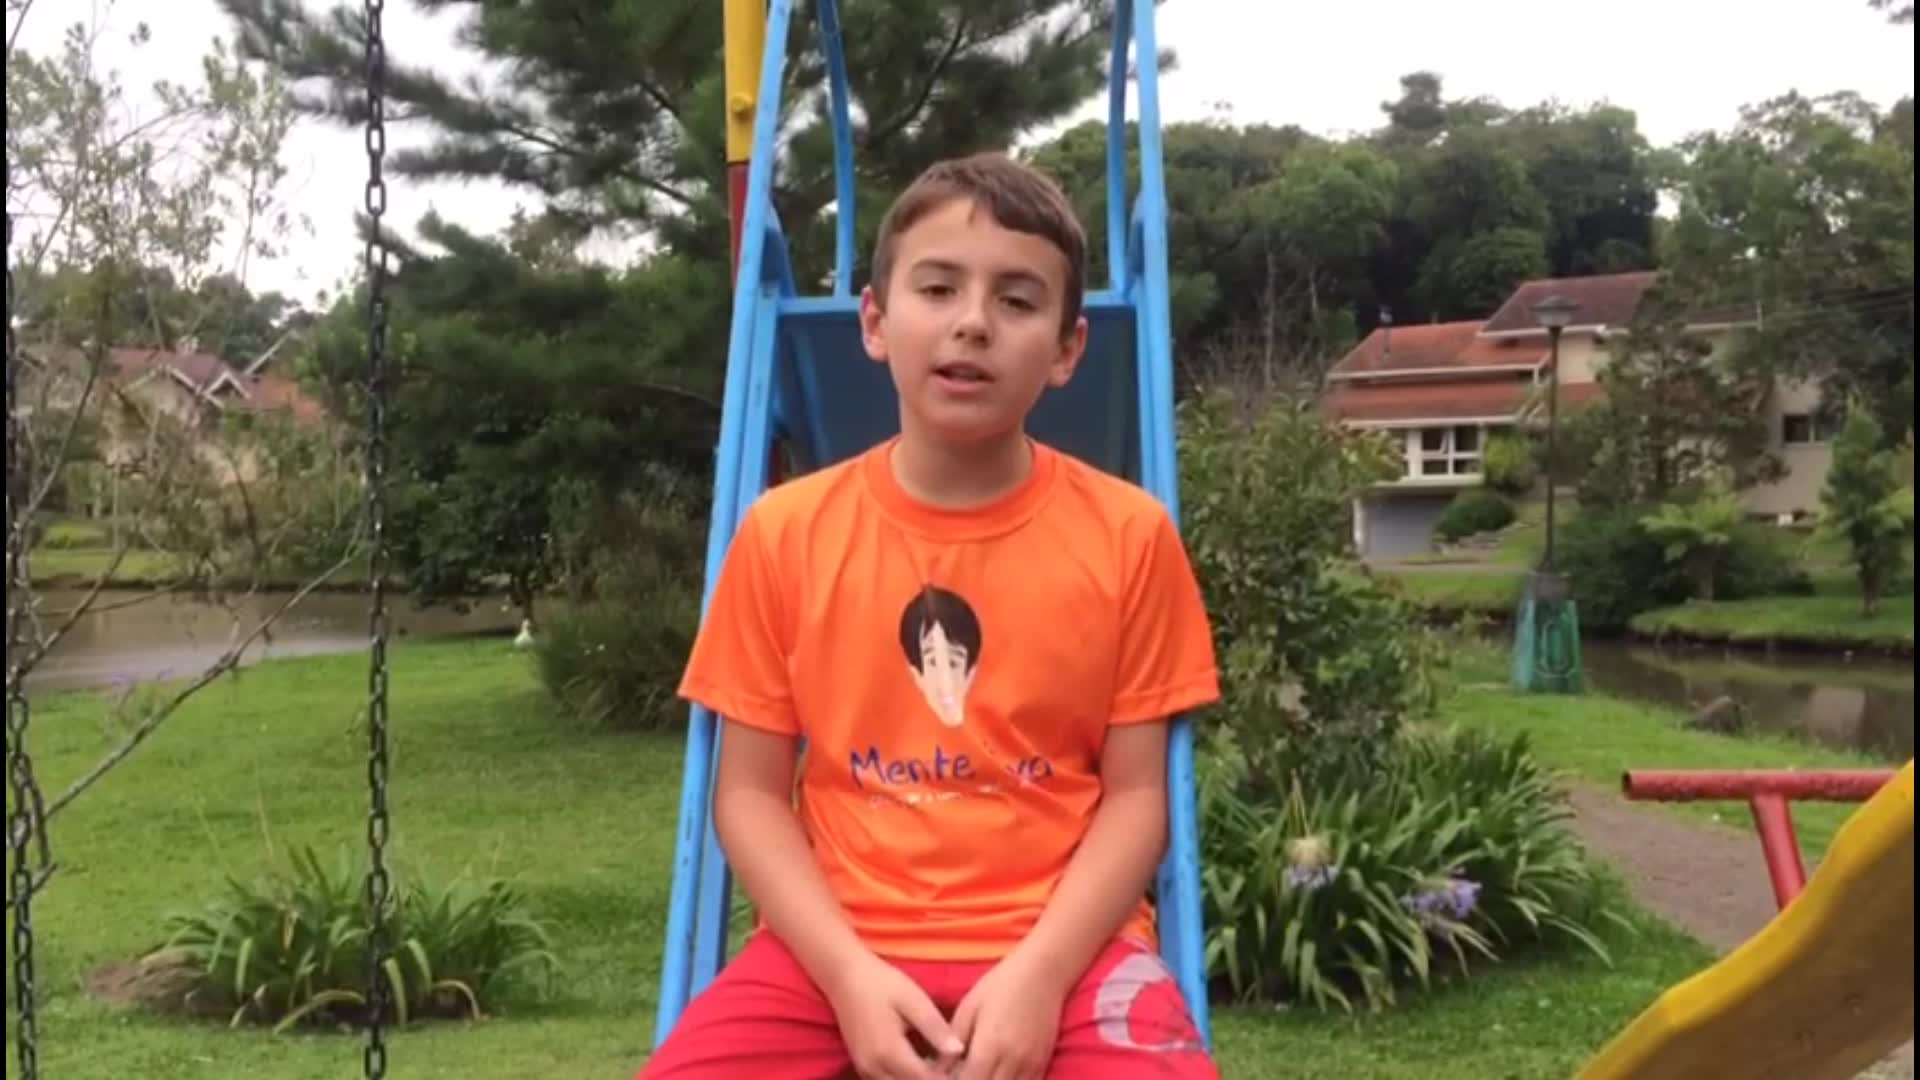 Programa Mente Viva - Dia da Borboleta